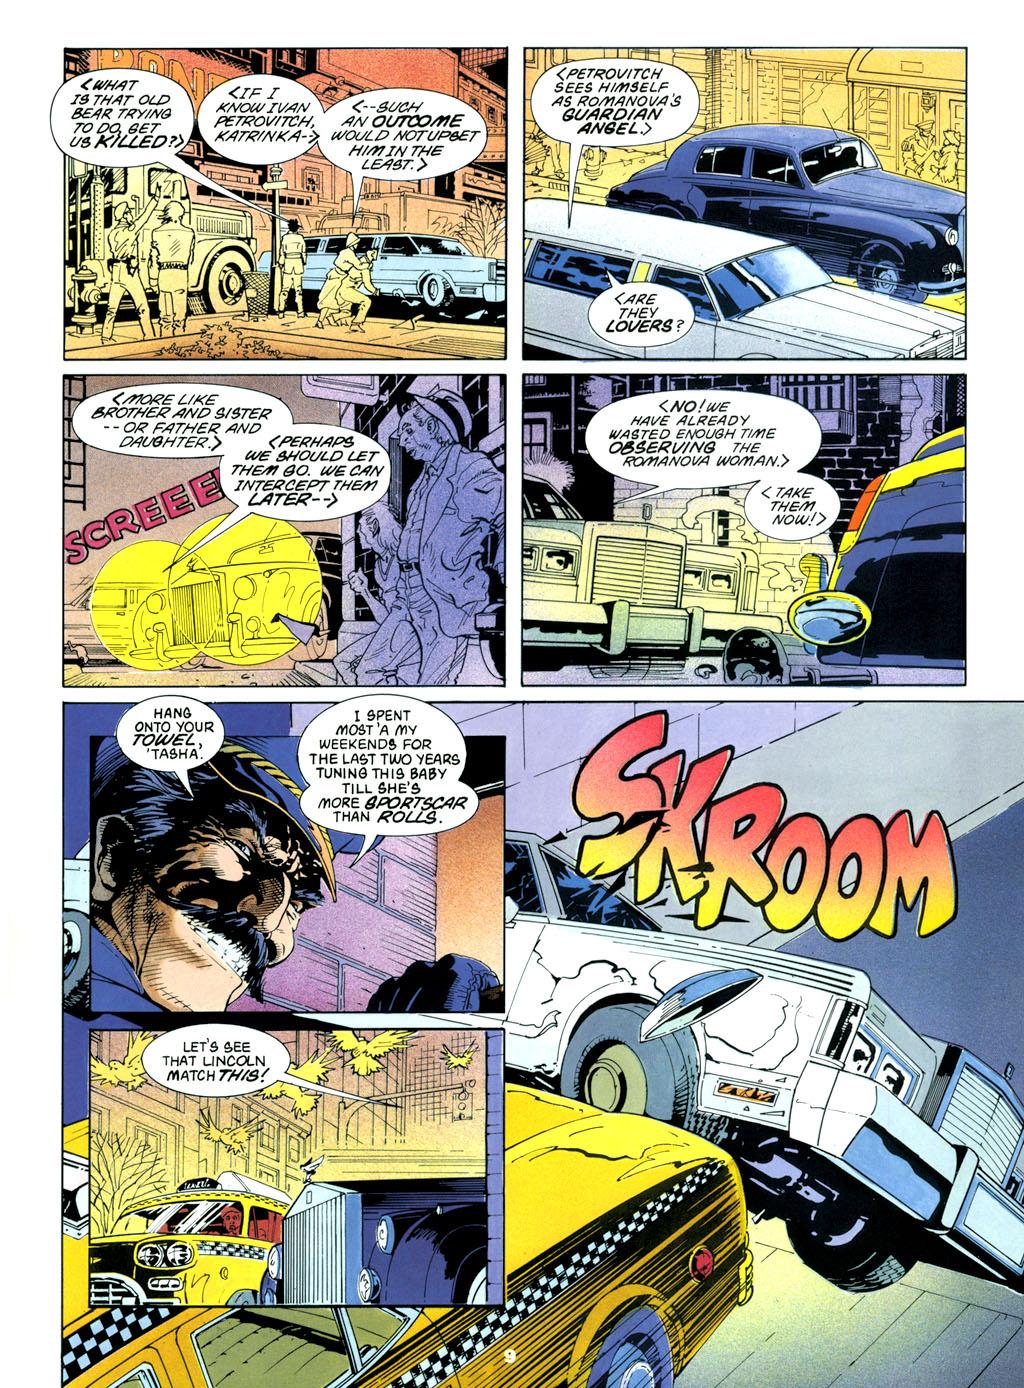 Read Online Marvel Graphic Novel Comic Issue 61 Black